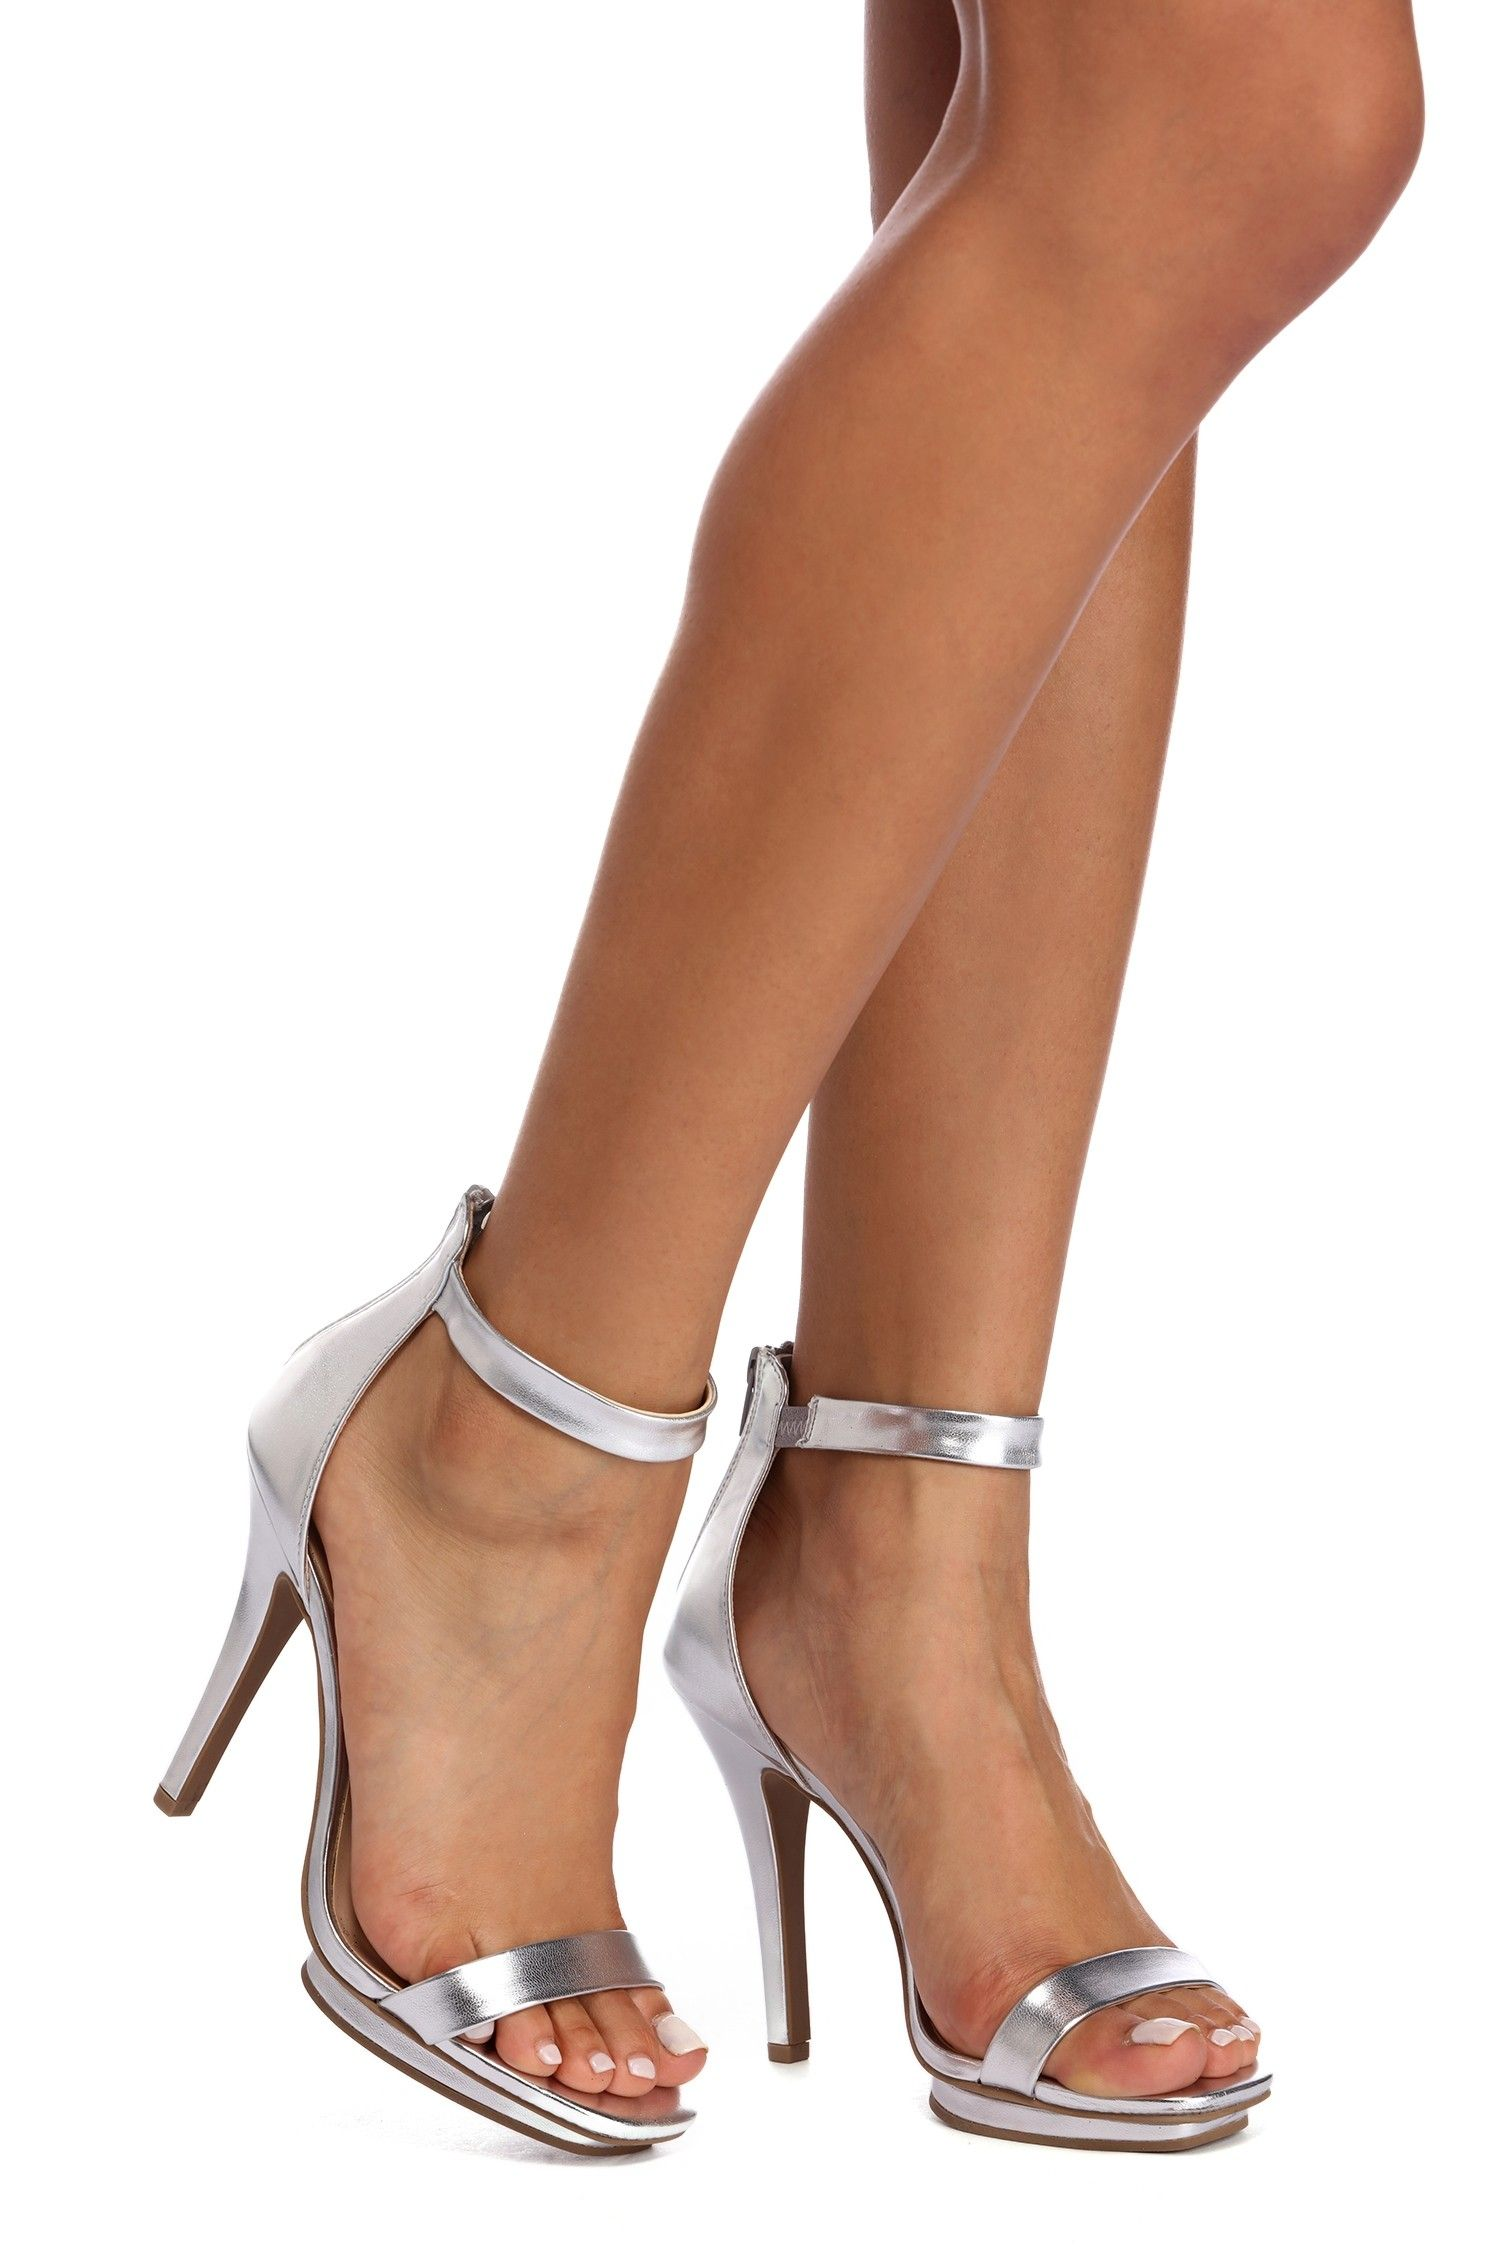 ec29c39890 Mesmerizing Metallic Platform Heels | my style, shoes | Heels ...